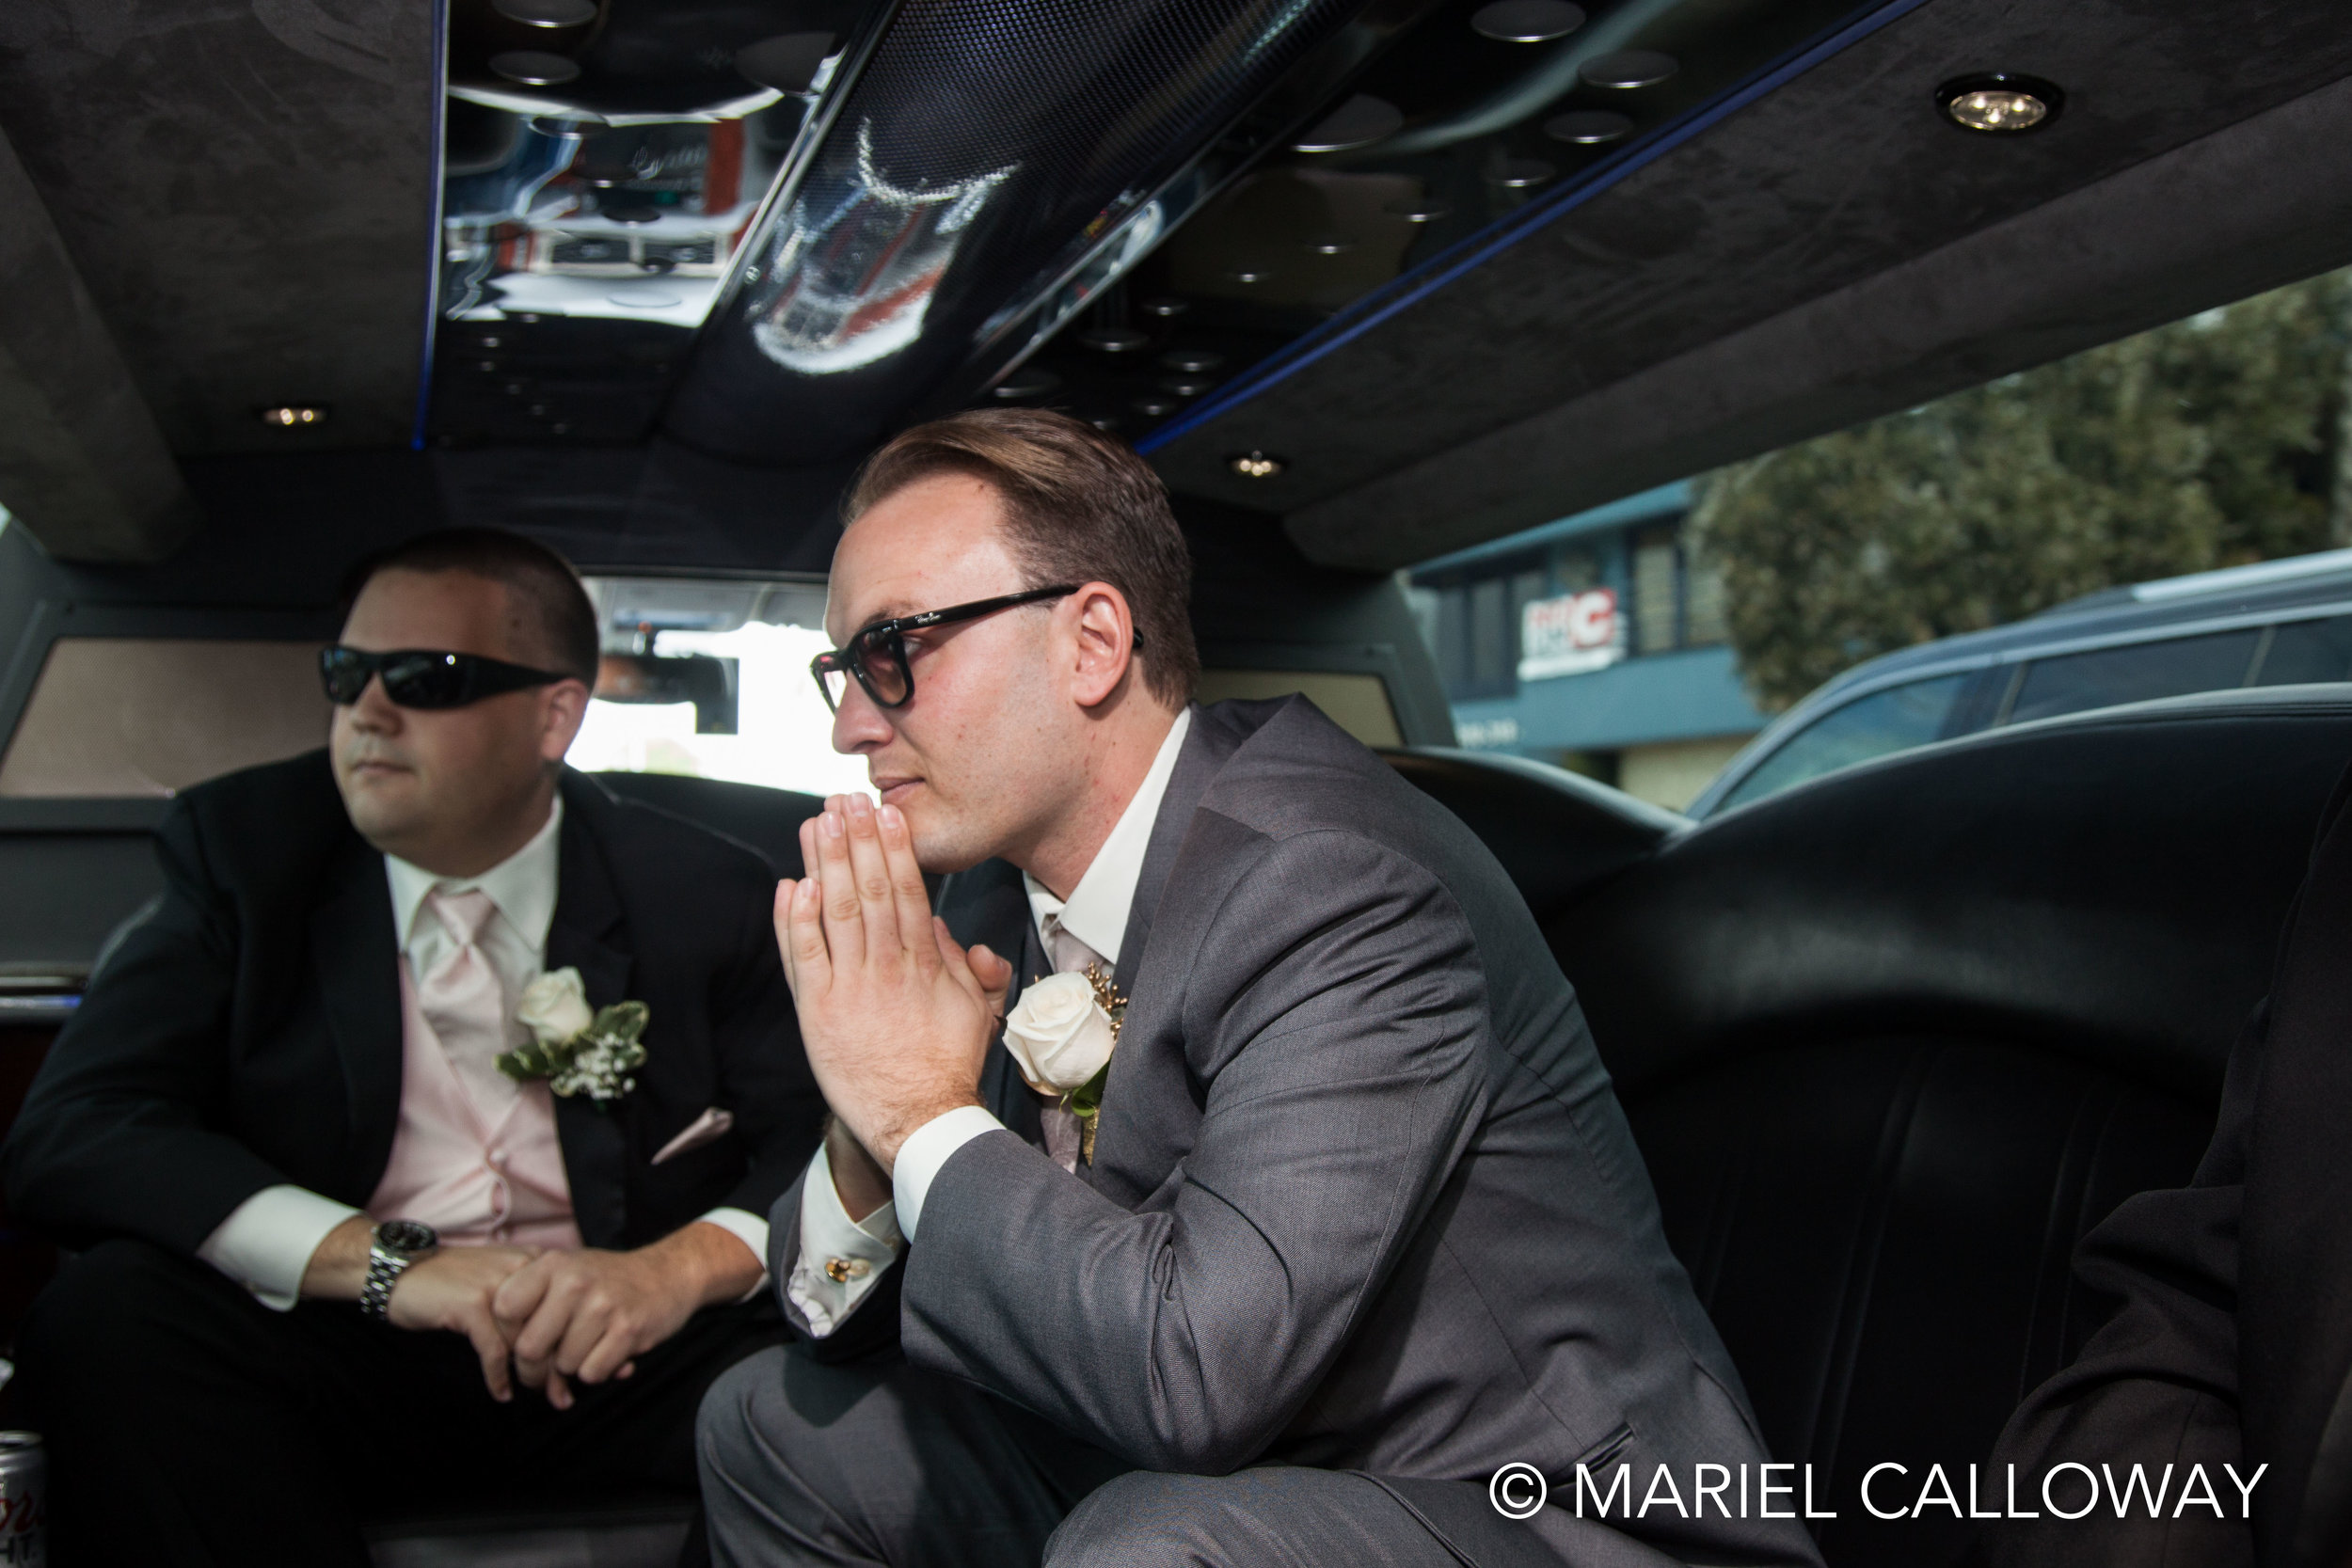 Mariel-Calloway-Los-Angeles-Wedding-Photography-Rossi-30.jpg